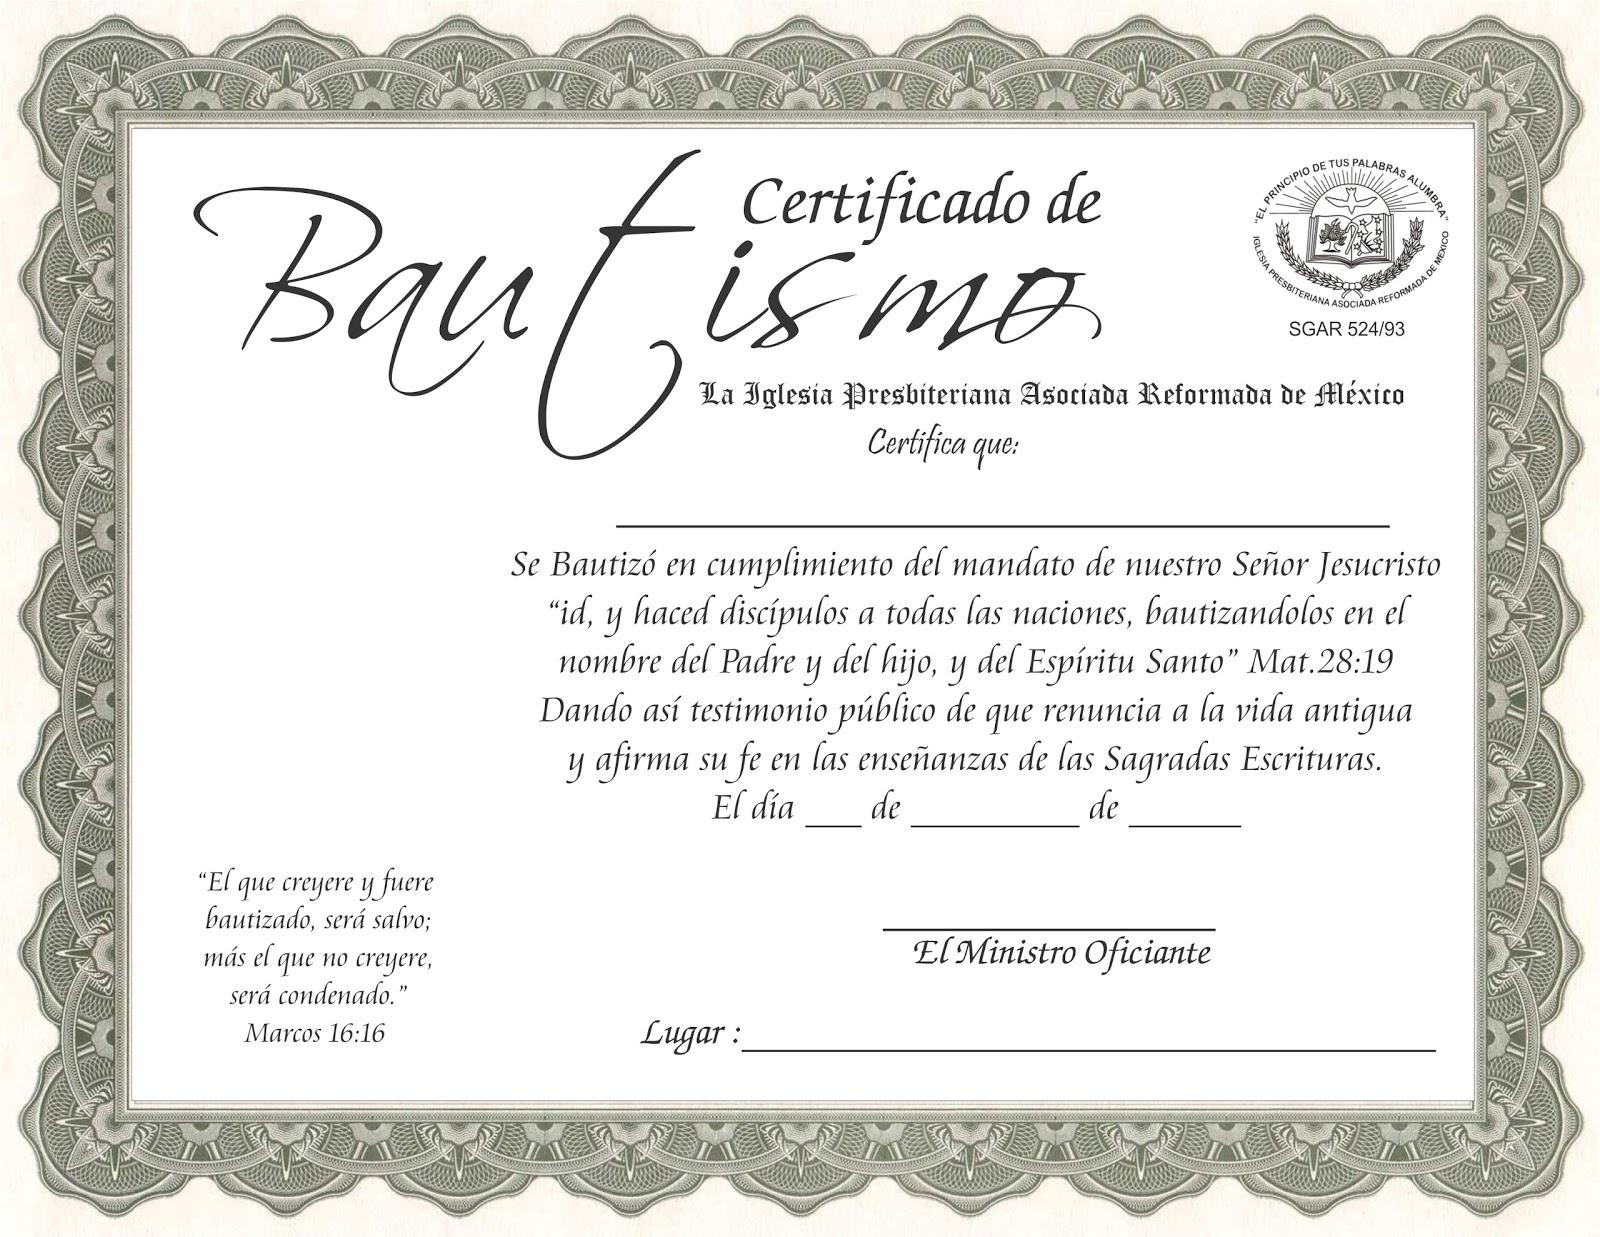 Acta De Matrimonio Catolico : Certificado de bautismo iglesia presbiteriana asociada